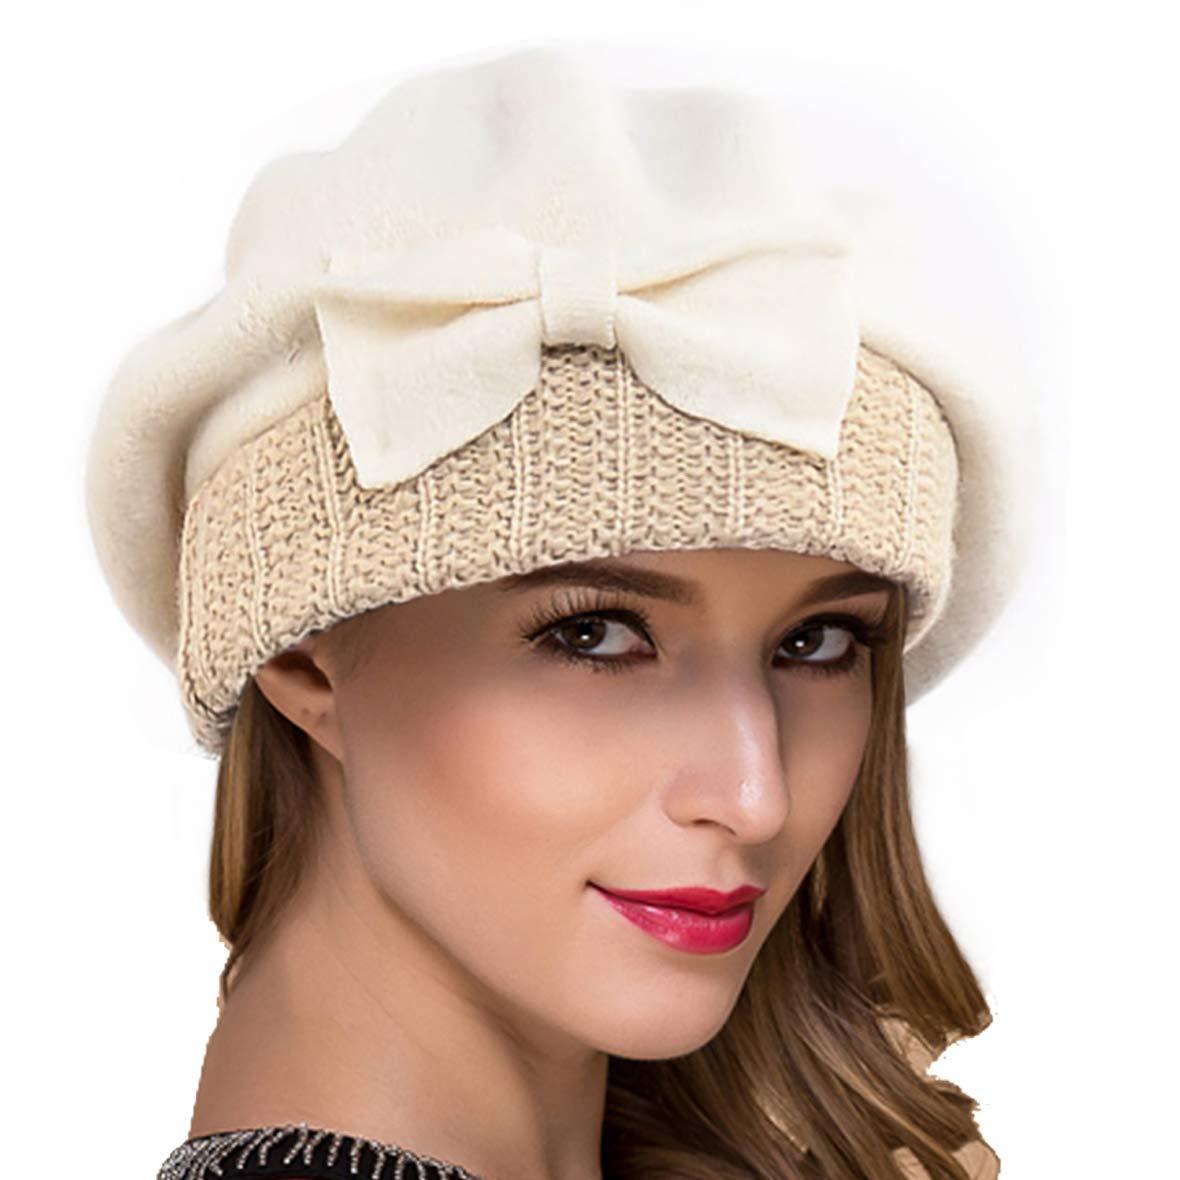 Ruphedy Women French Beret Knit Wool Beret Beanie Winter Dress Hats Hy022 (Cream)